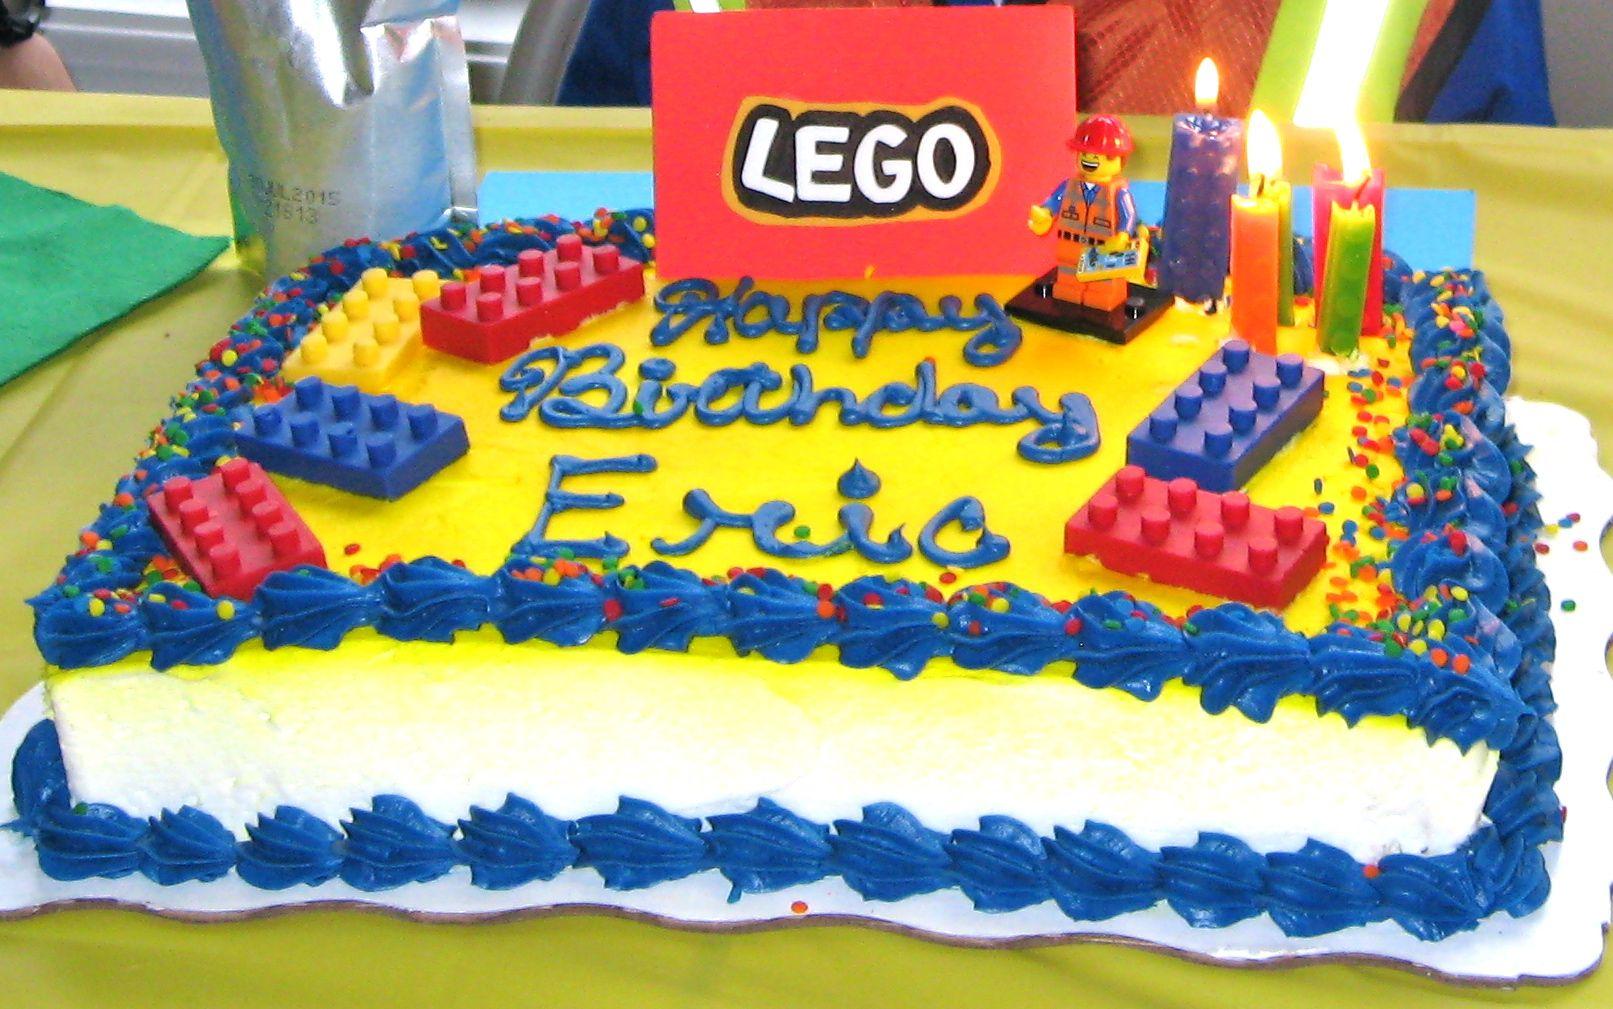 Semi Diy Lego Cake Grocery Store Cake I Added The Candy Lego